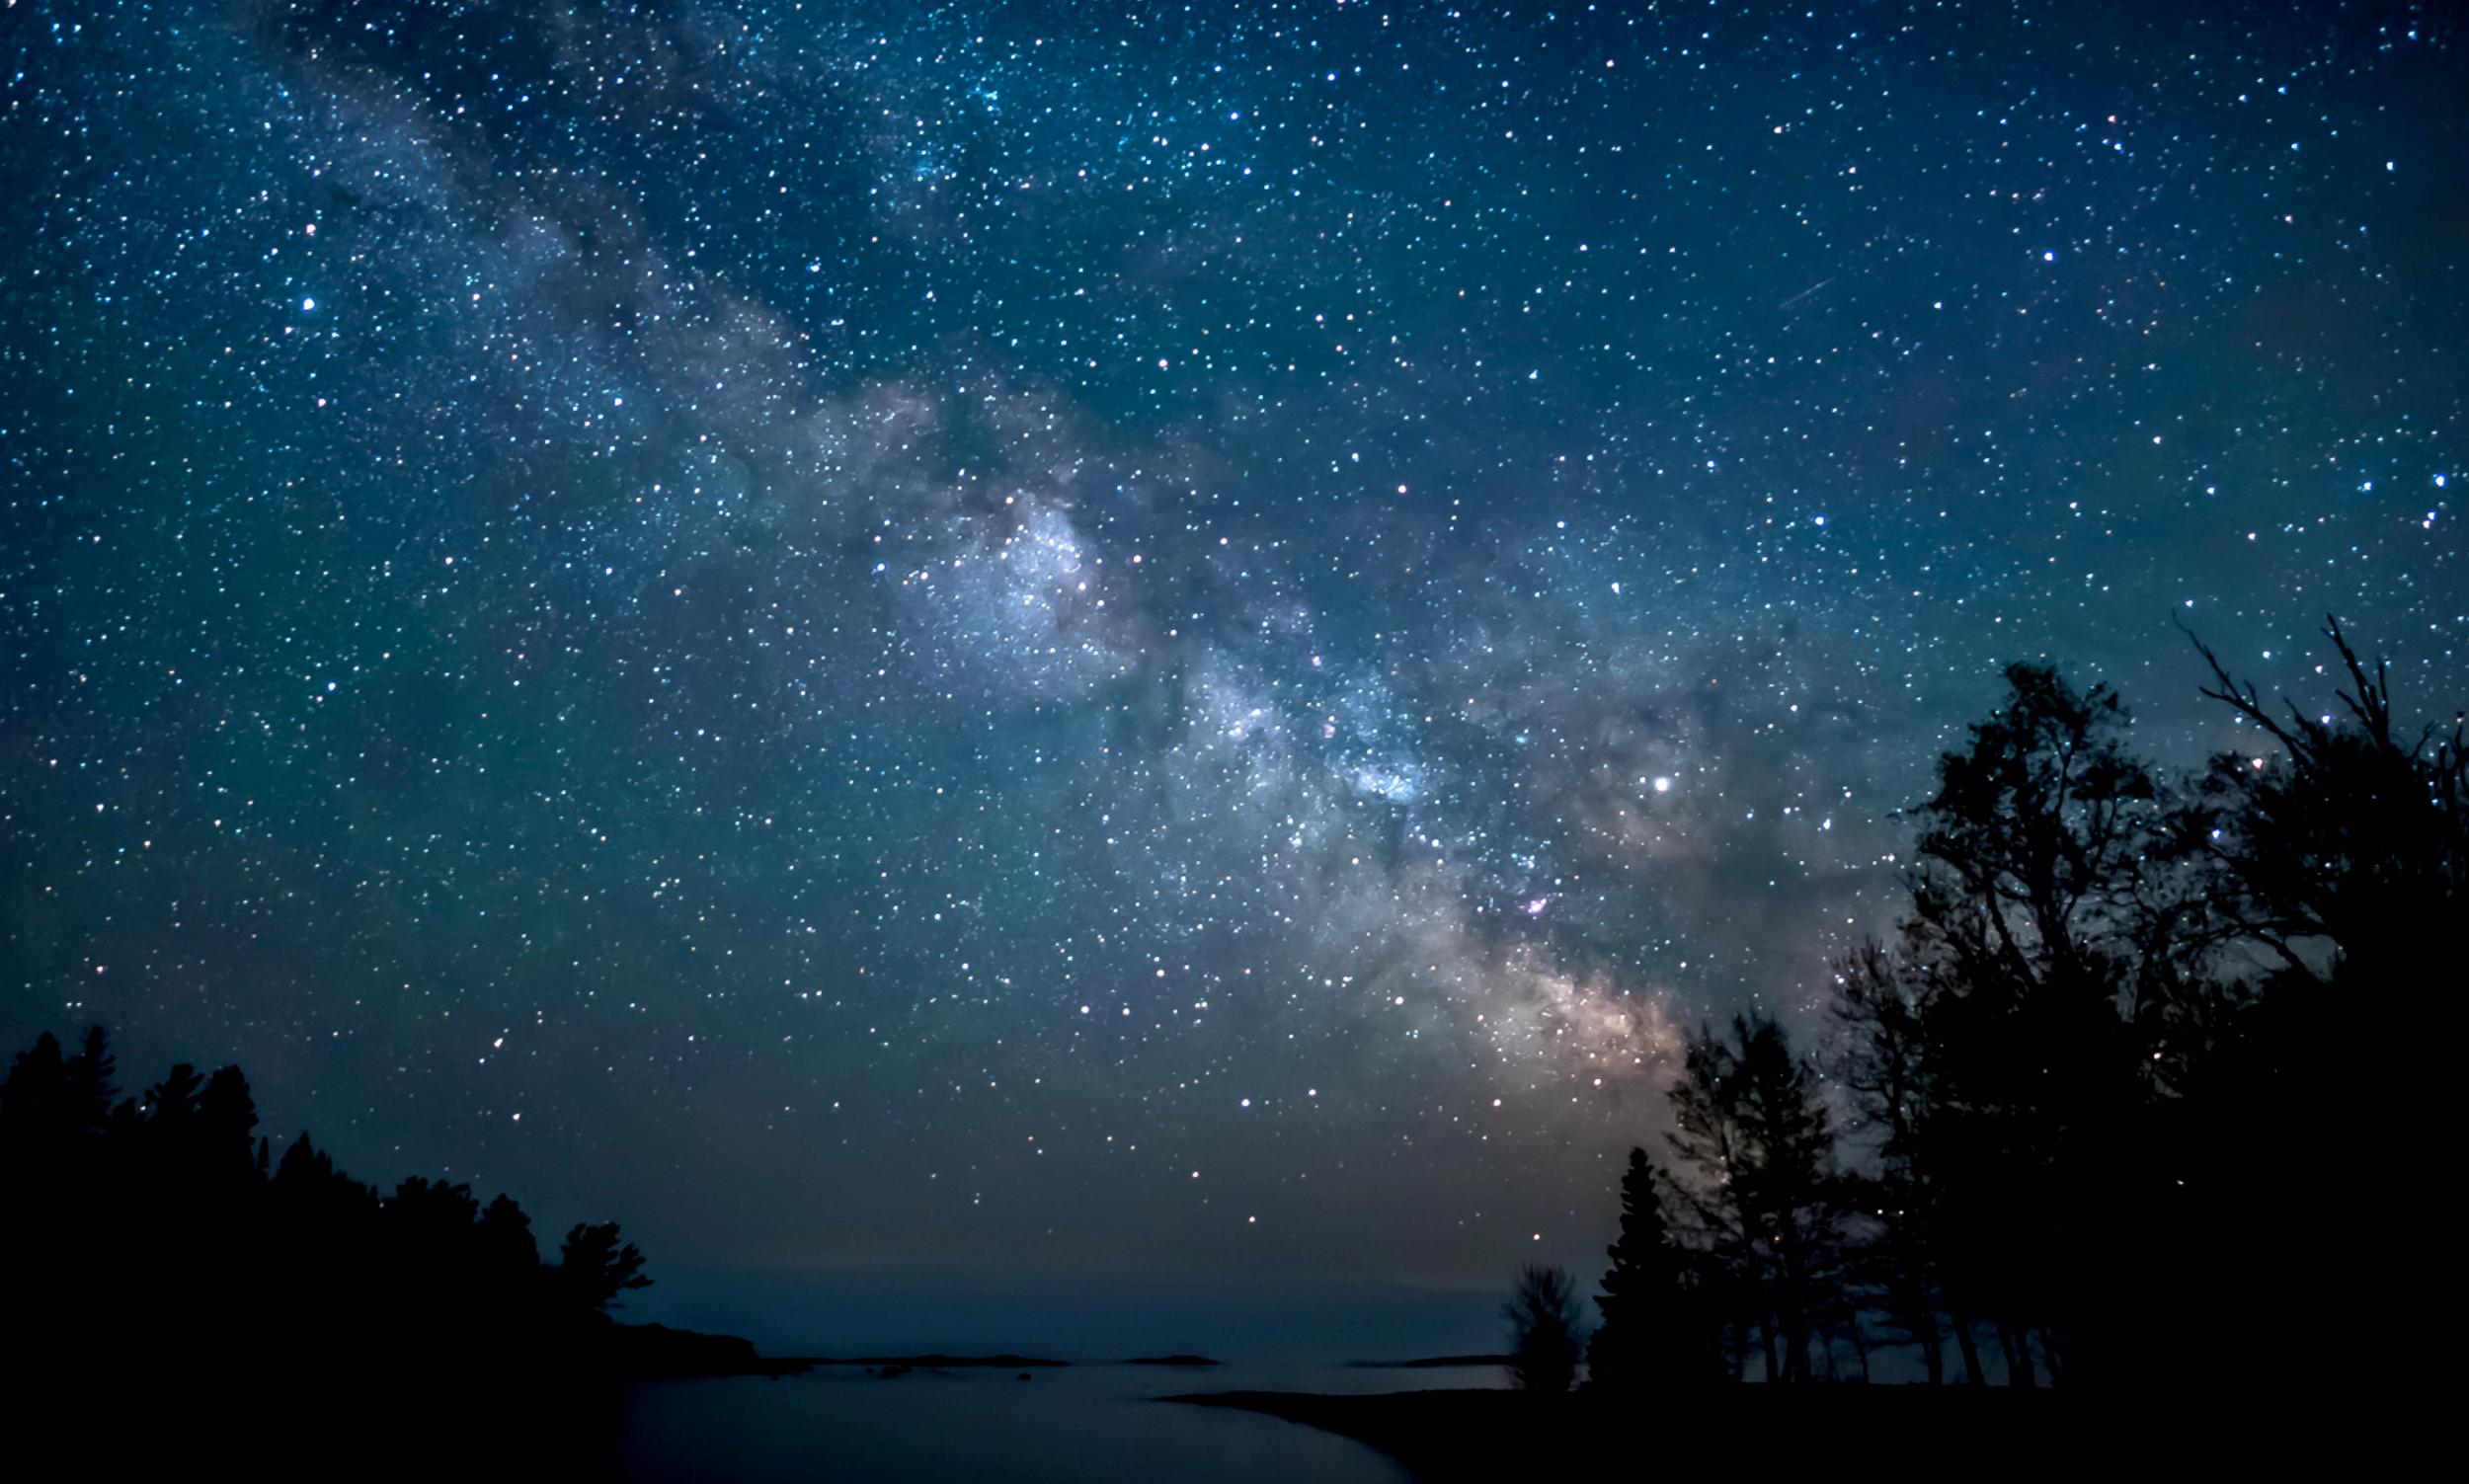 Celebrate the Night Sky Week - September 15-21, 2019